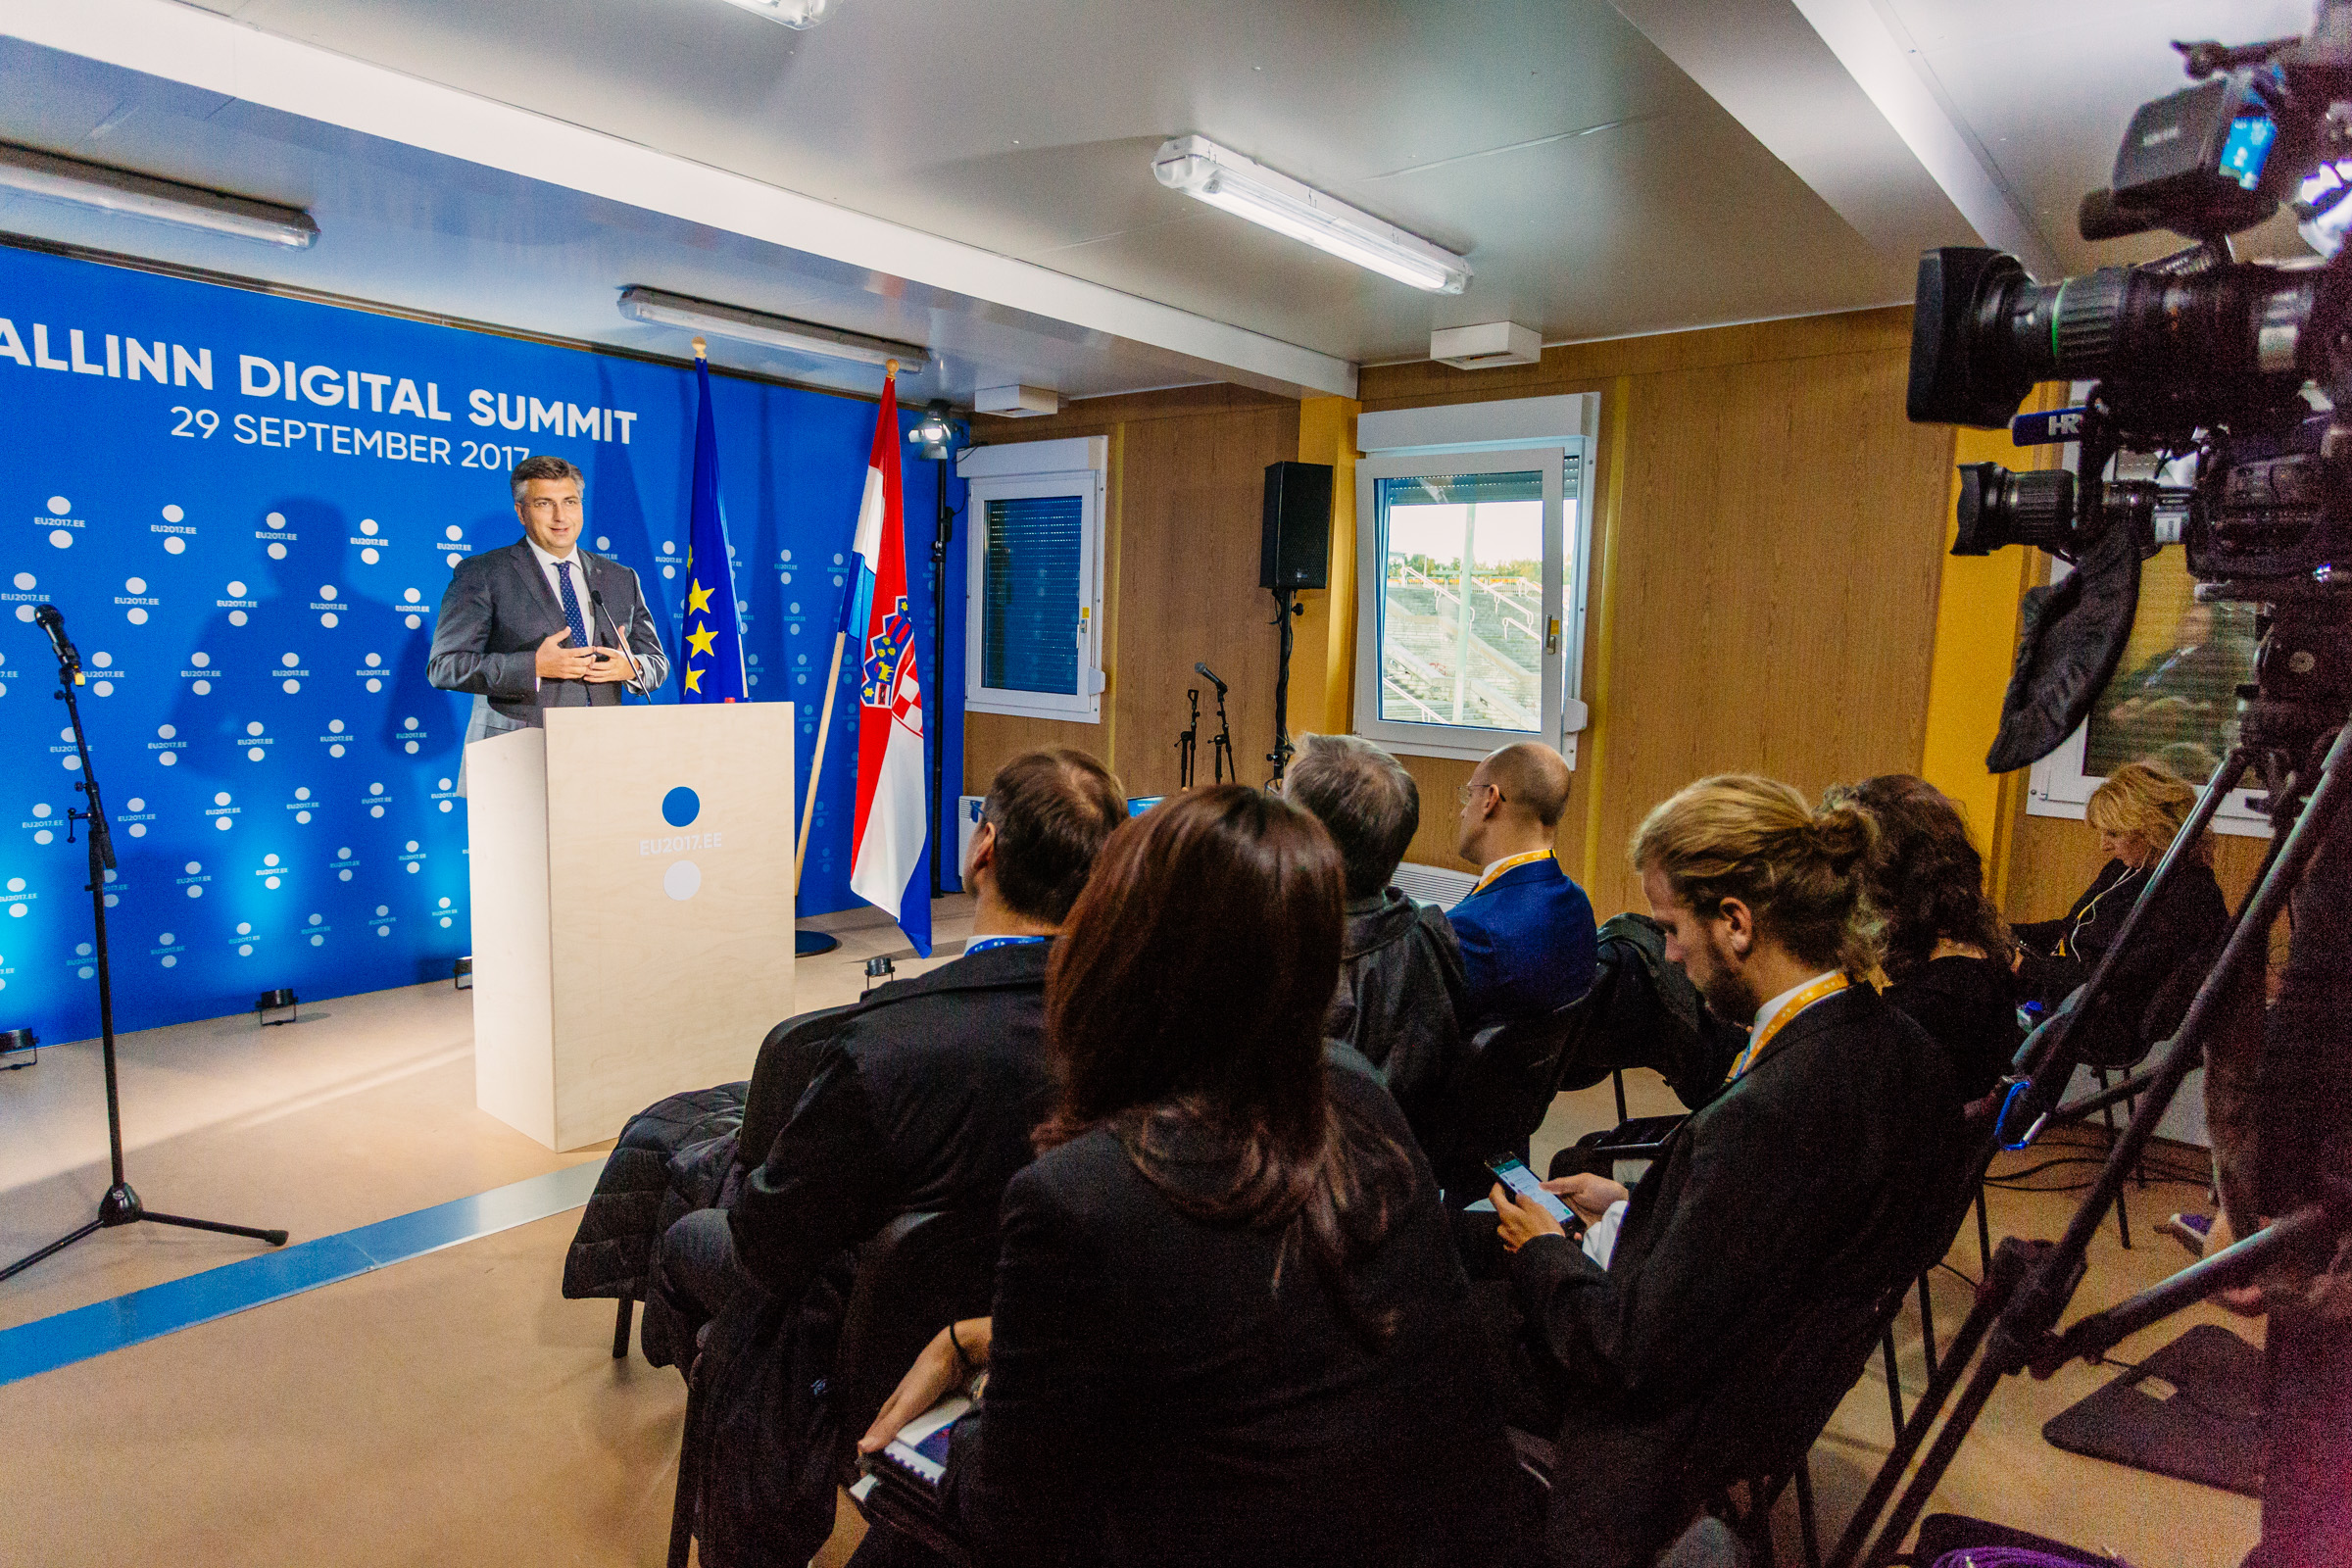 Exit doorstep and member statesu0027 press conferences Andrej Plenkovi? & File:Tallinn Digital Summit. Exit doorstep and member statesu0027 press ...